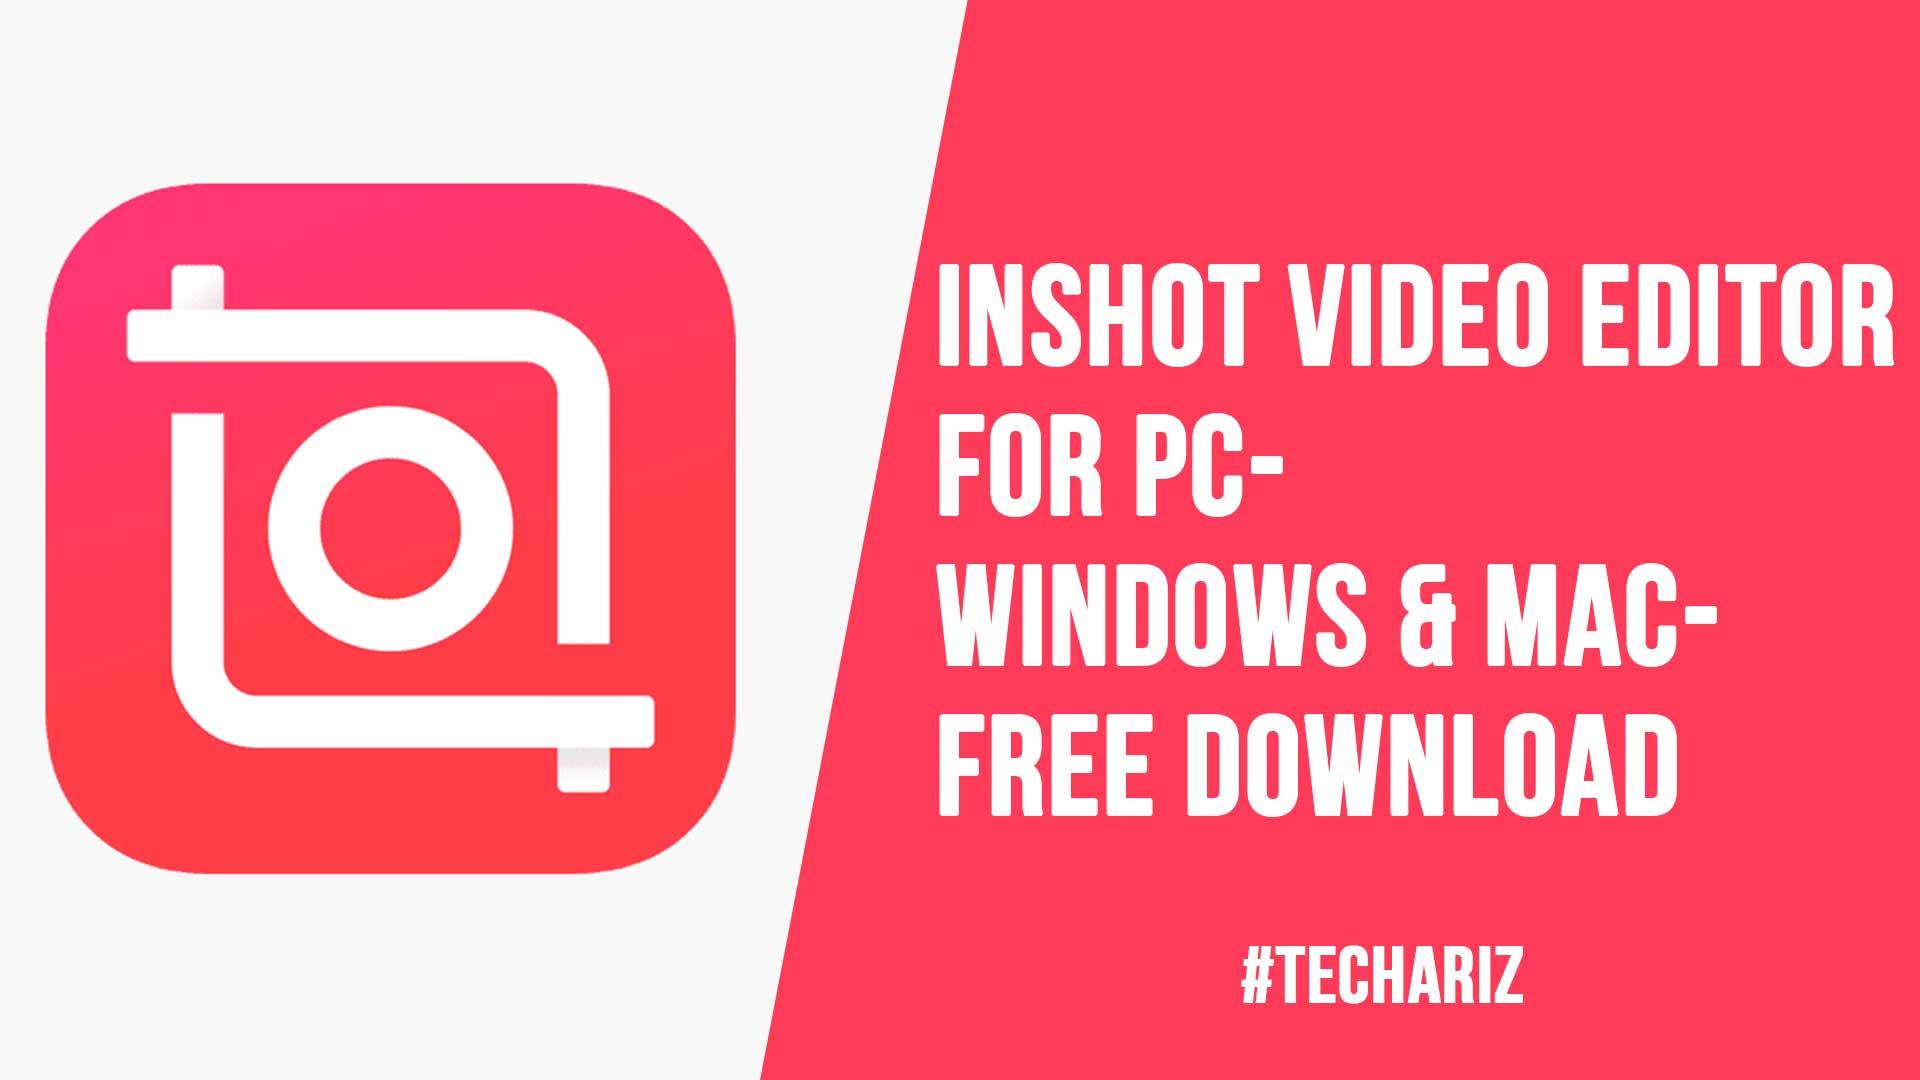 InShot Video Editor for PC Windows Mac Free Download